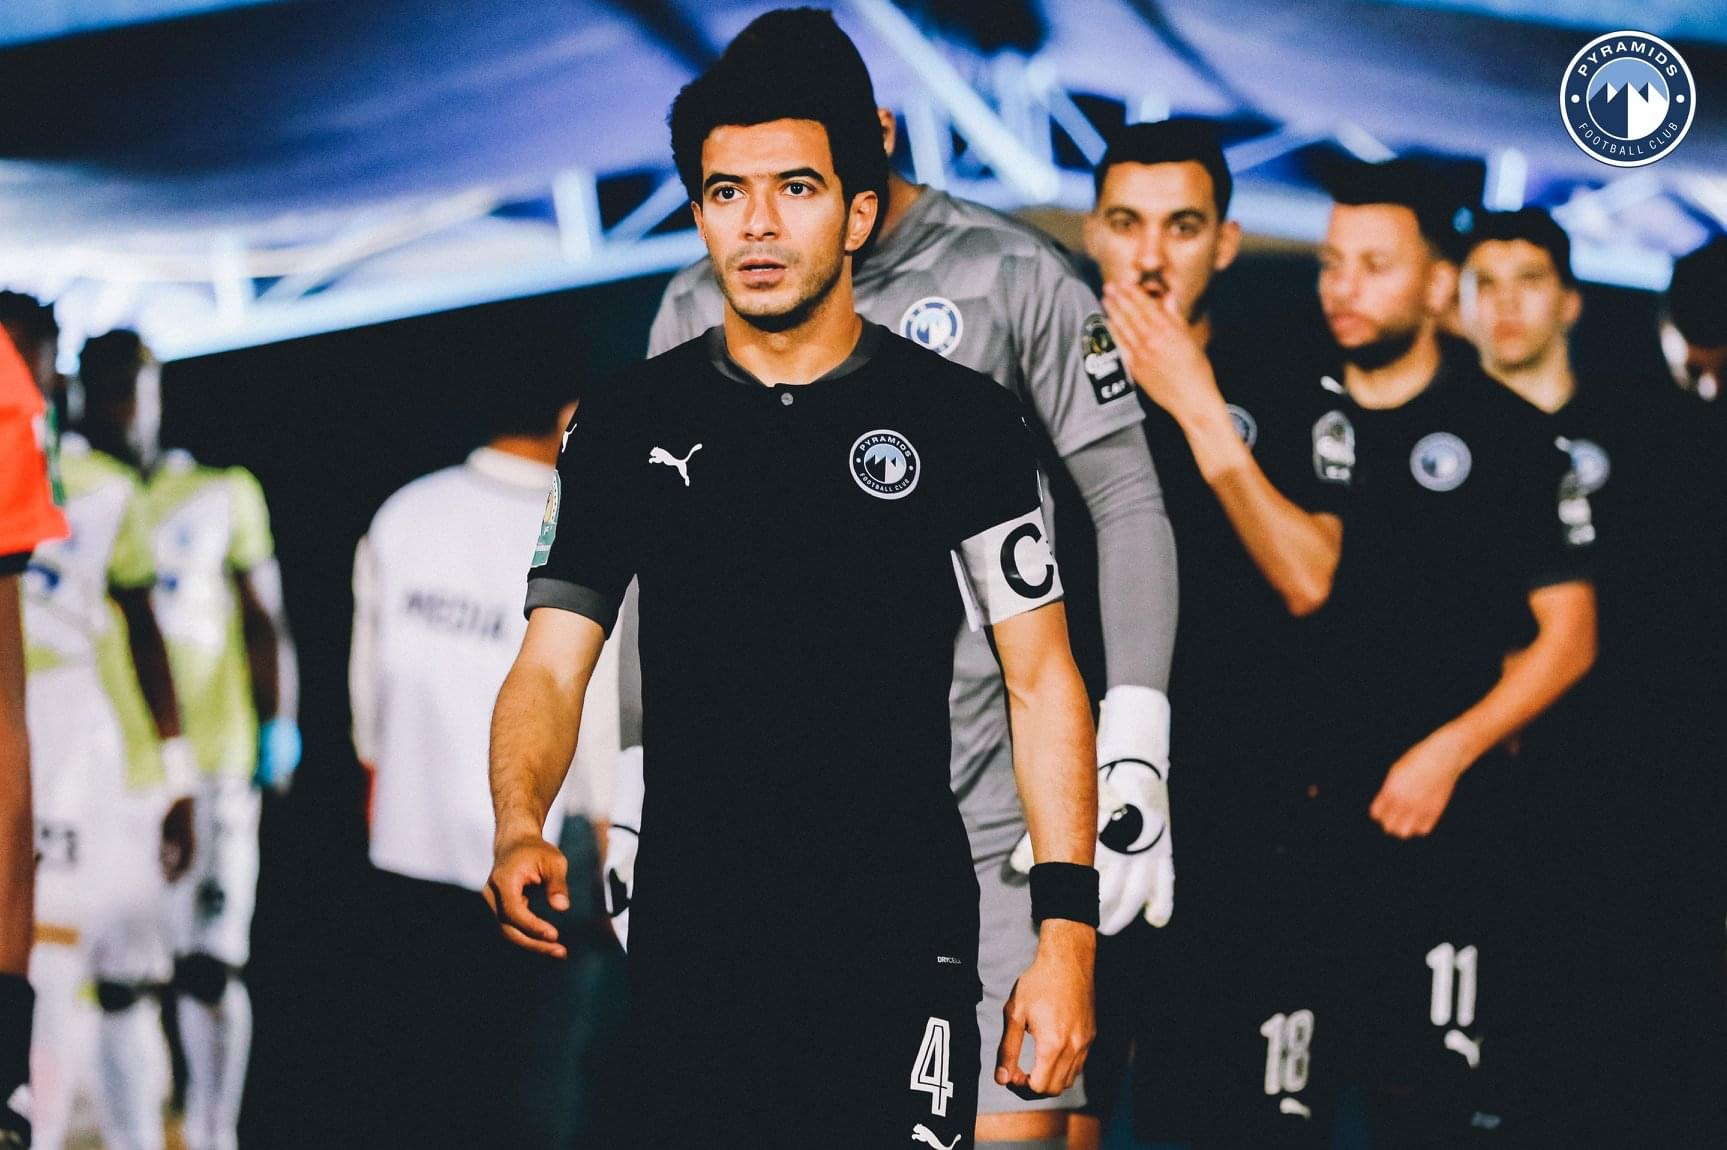 Football, CAF Confederation Cup : la Jeunesse Sportive de Kabylie, Pyramids Football Club en quart, le Raja termine invaincu